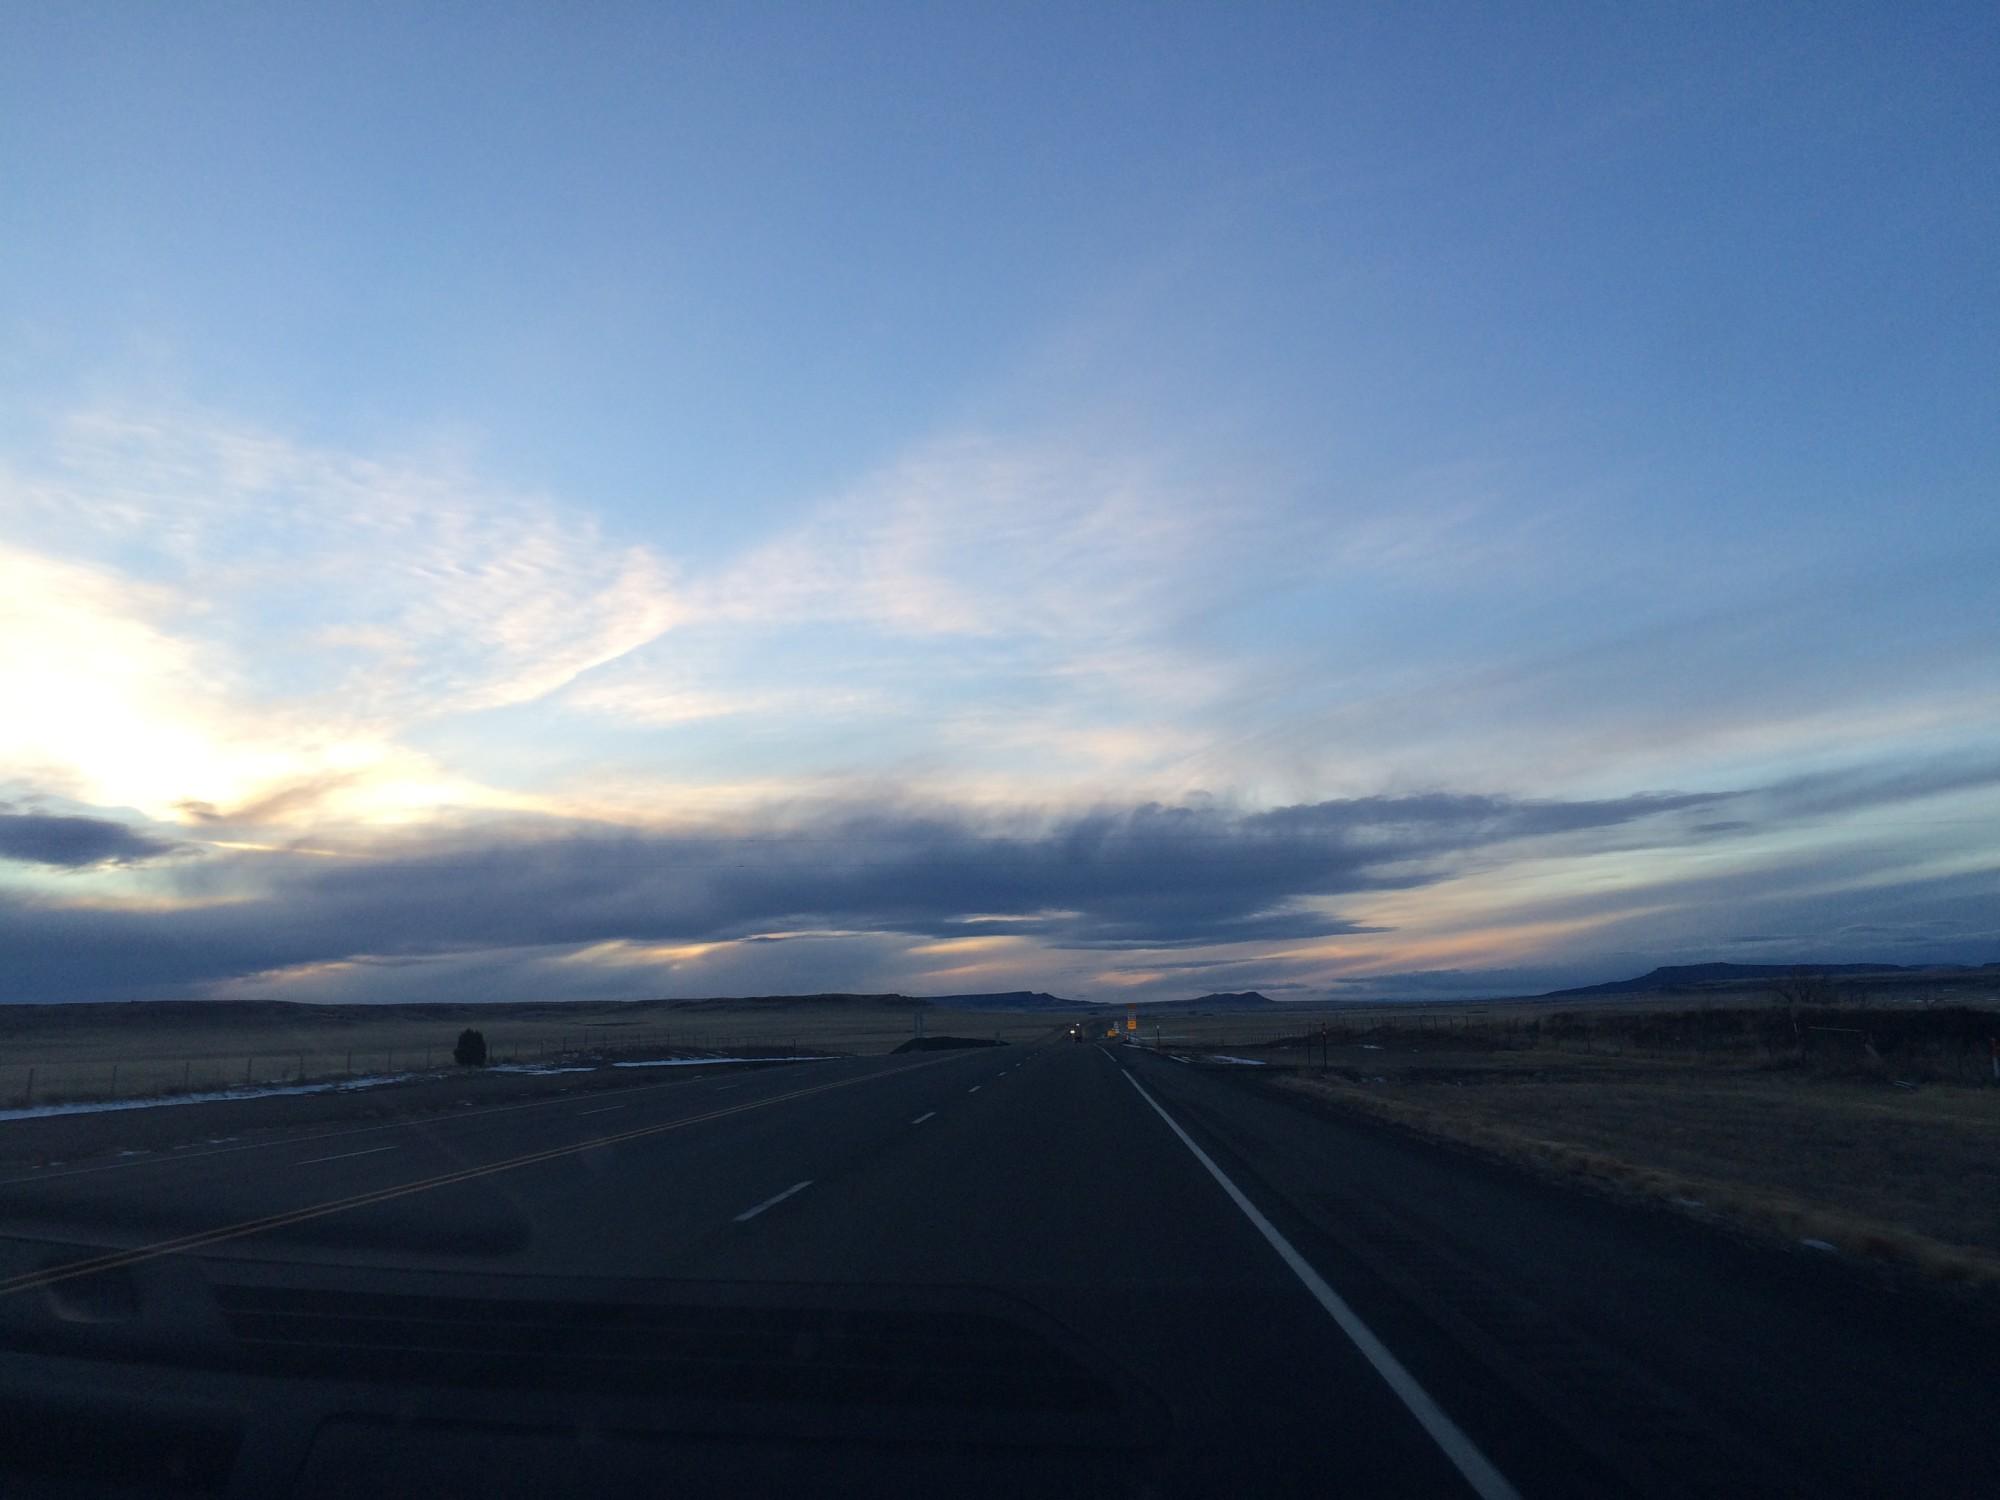 Sun setting in New Mexico